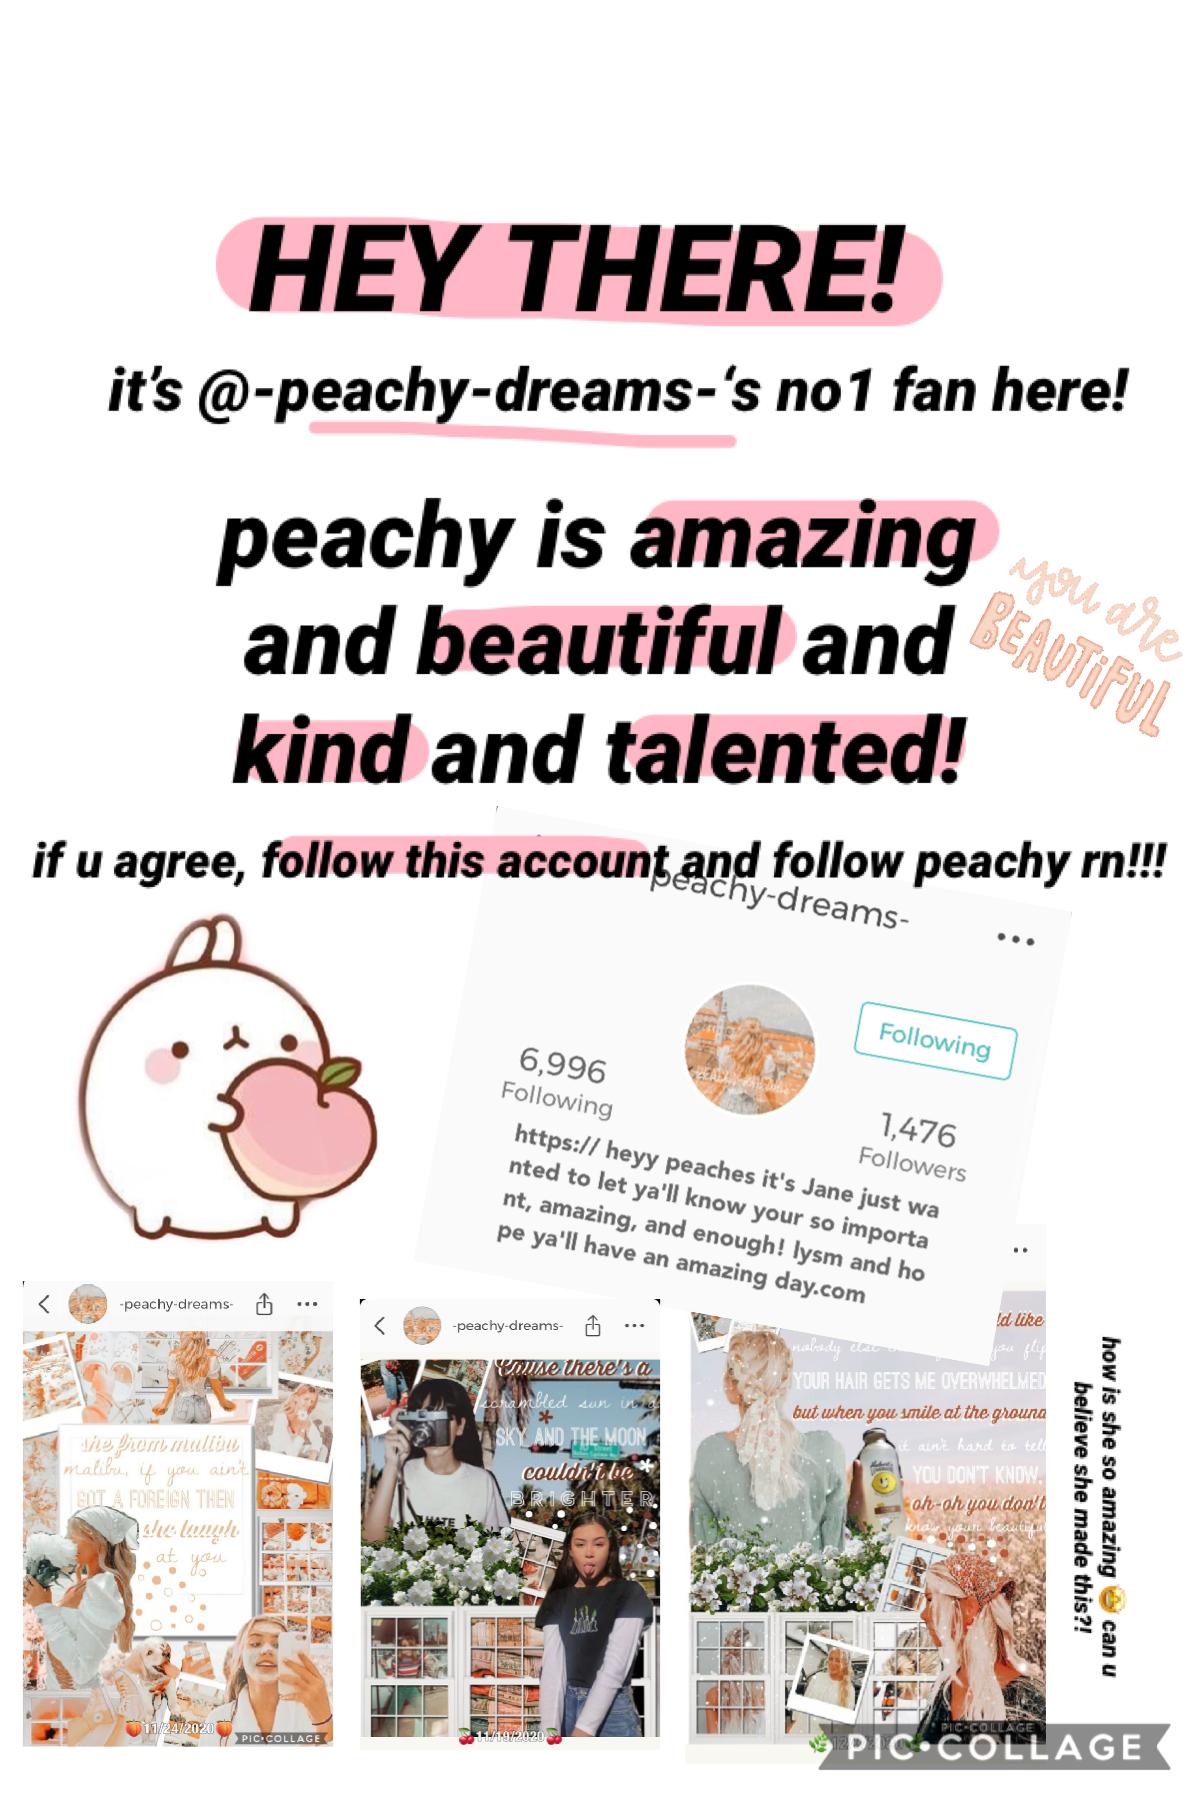 🍑FOLLOW PEACHY {tap}🍑  hello sweeties it's peachy's no1 fan here! follow this accounting u love peachy!!! 🍑♥️🍑♥️🍑♥️